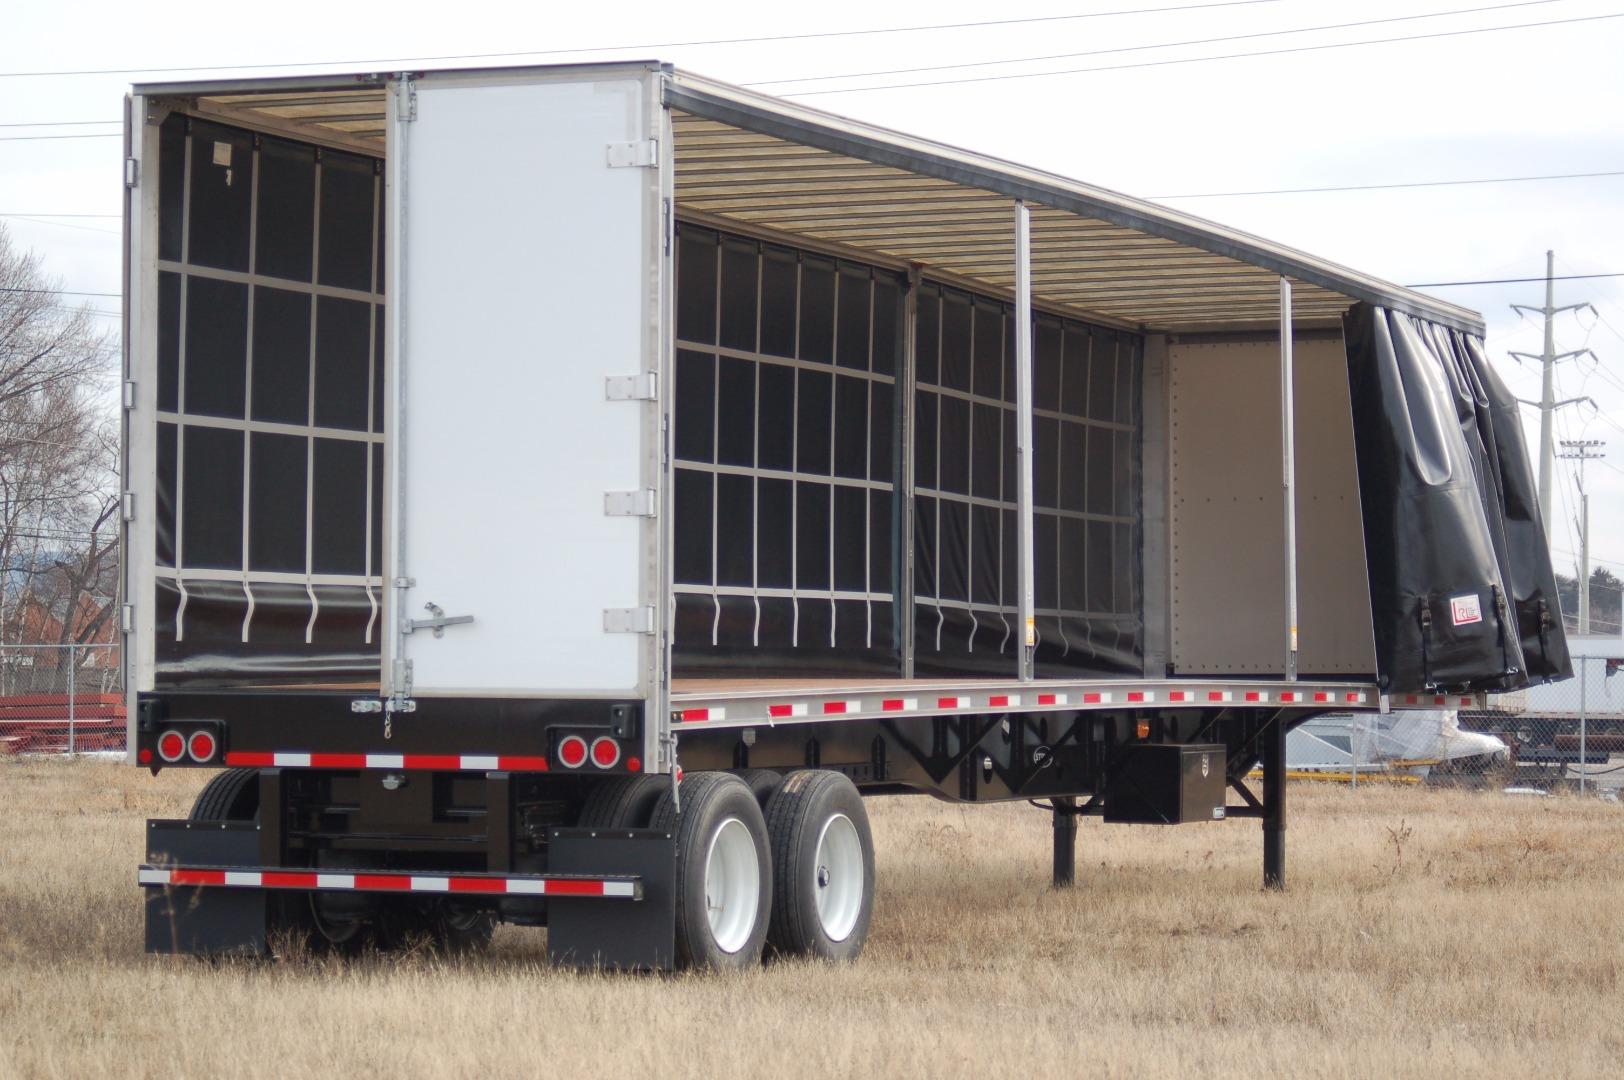 48 curtainside trailer